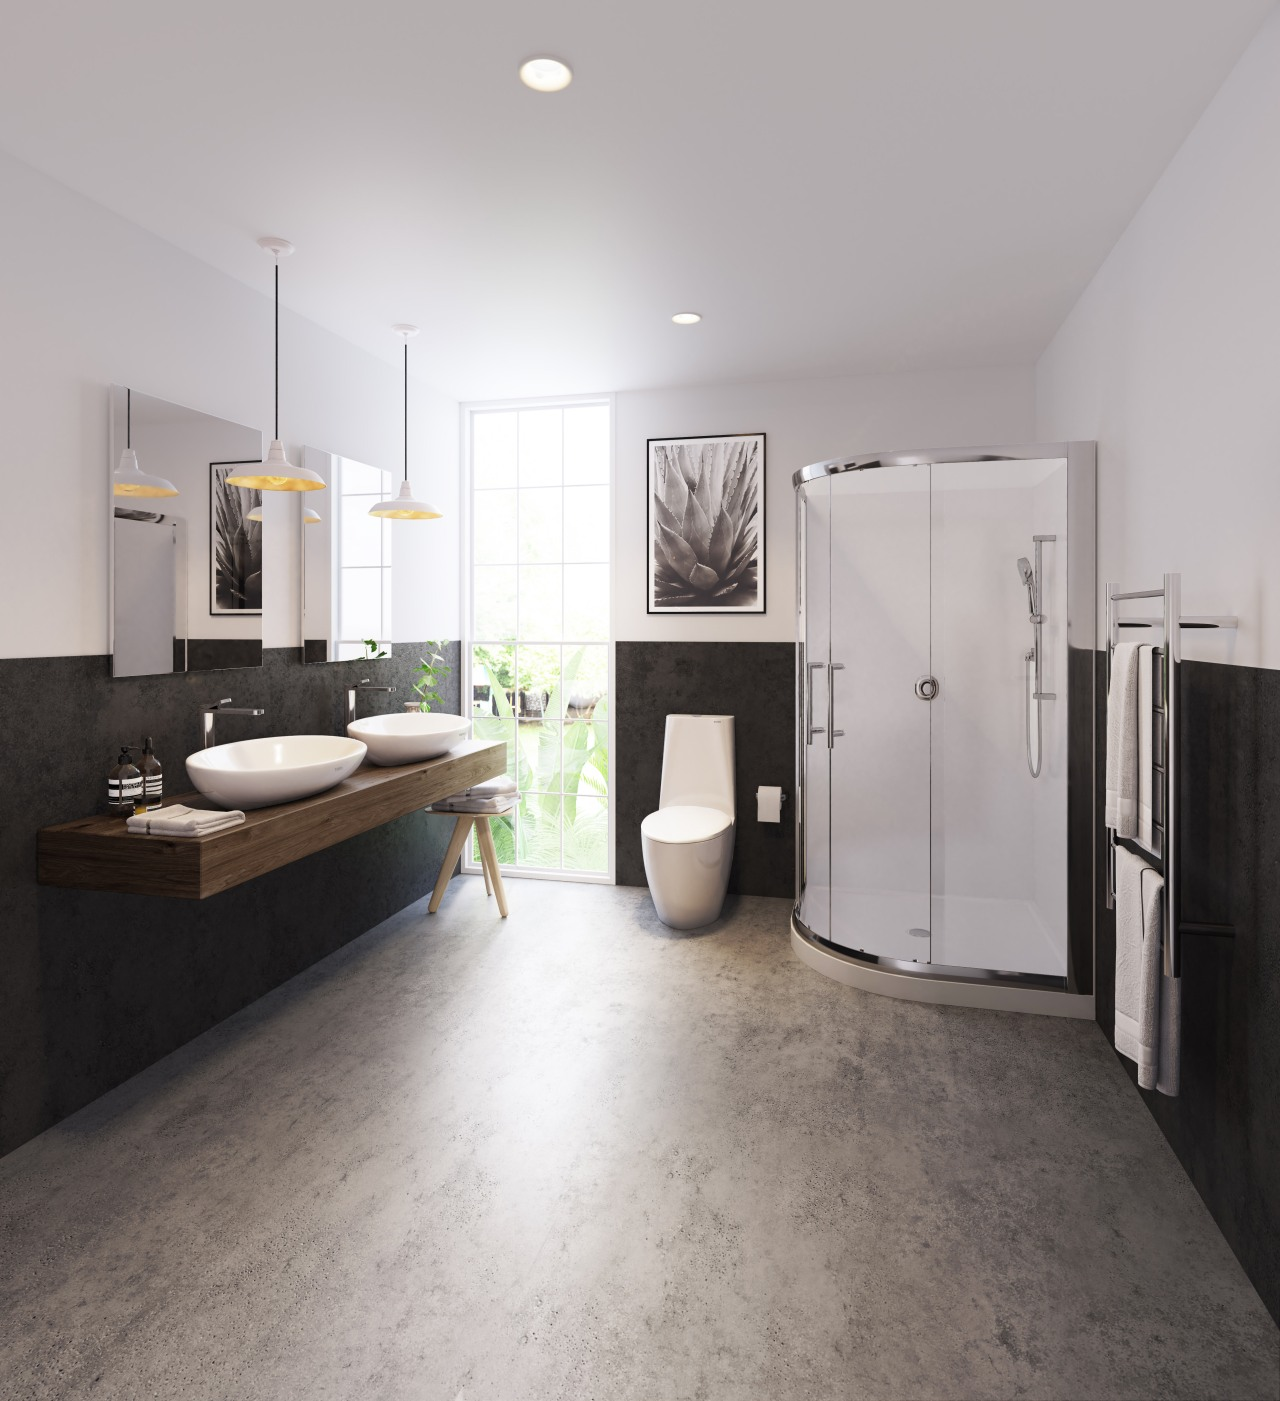 With a wealth of subtle distinctions between TOTO bathroom, floor, flooring, interior design, laminate flooring, plumbing fixture, real estate, room, sink, tile, wood flooring, gray